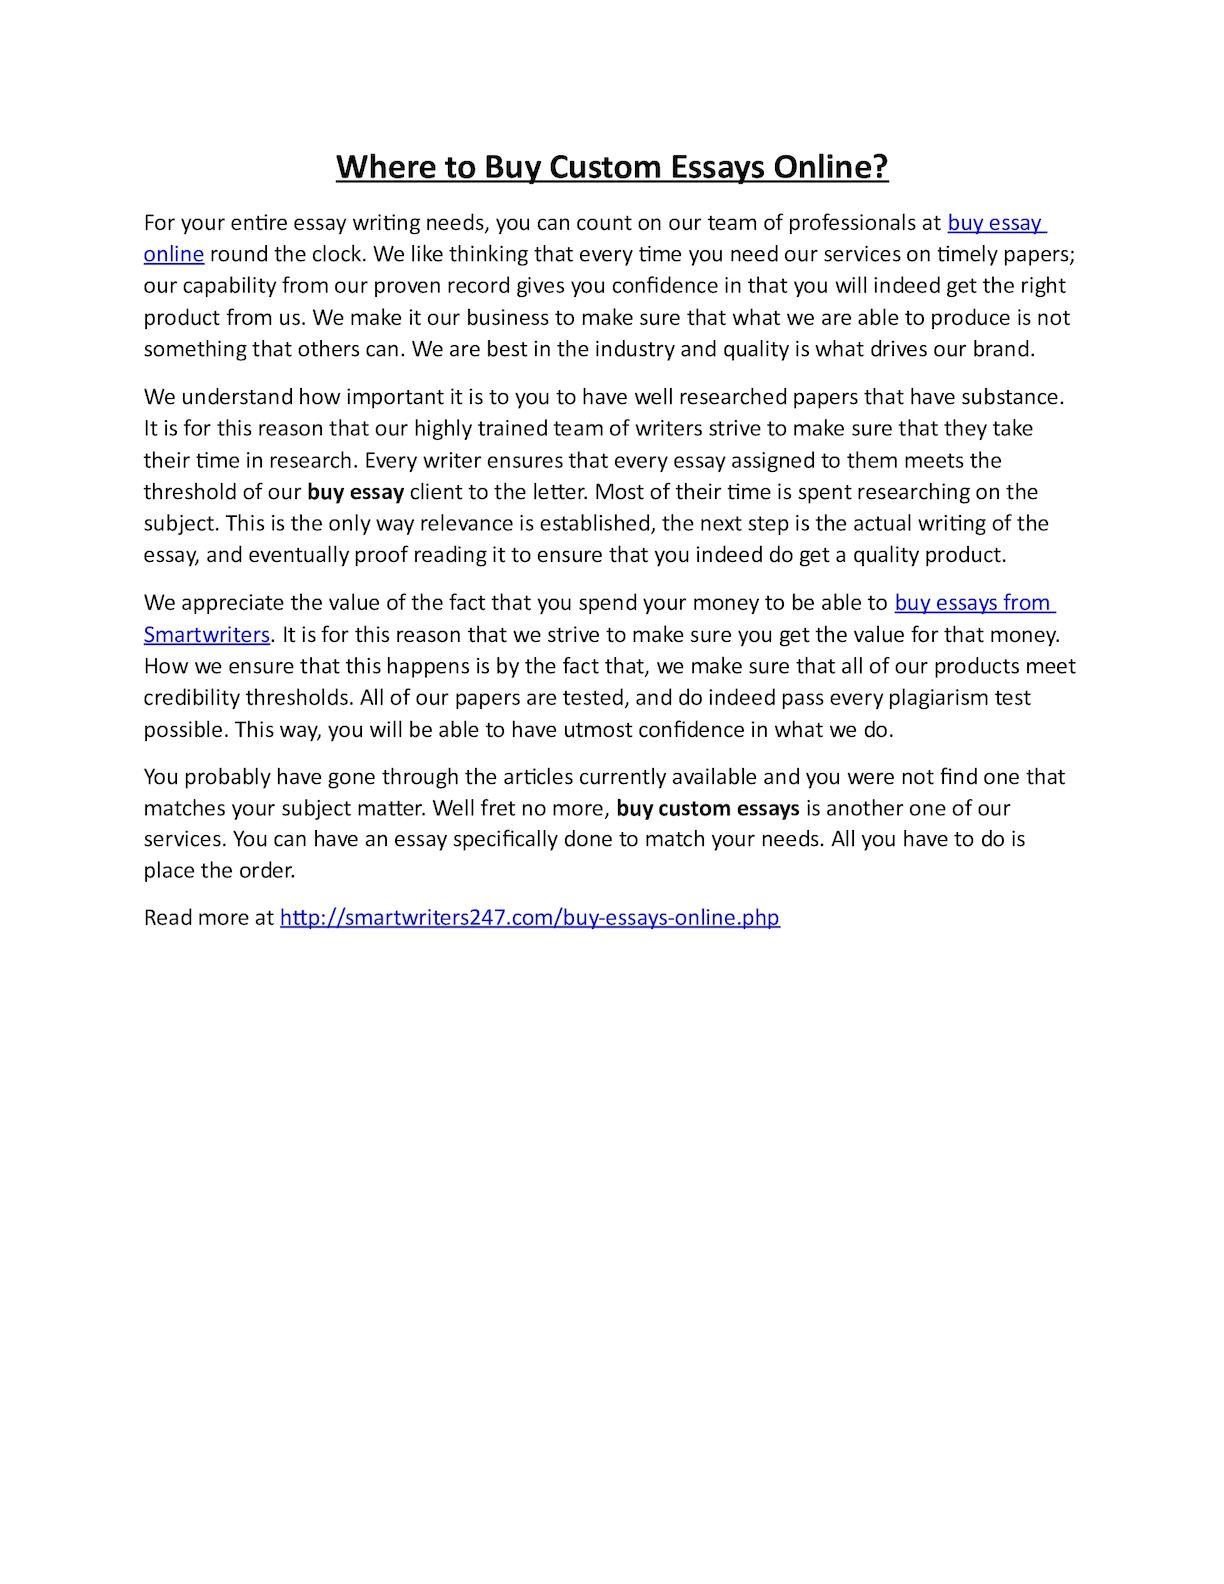 010 Essay Example P1 Buy Custom Essays Impressive Online Full